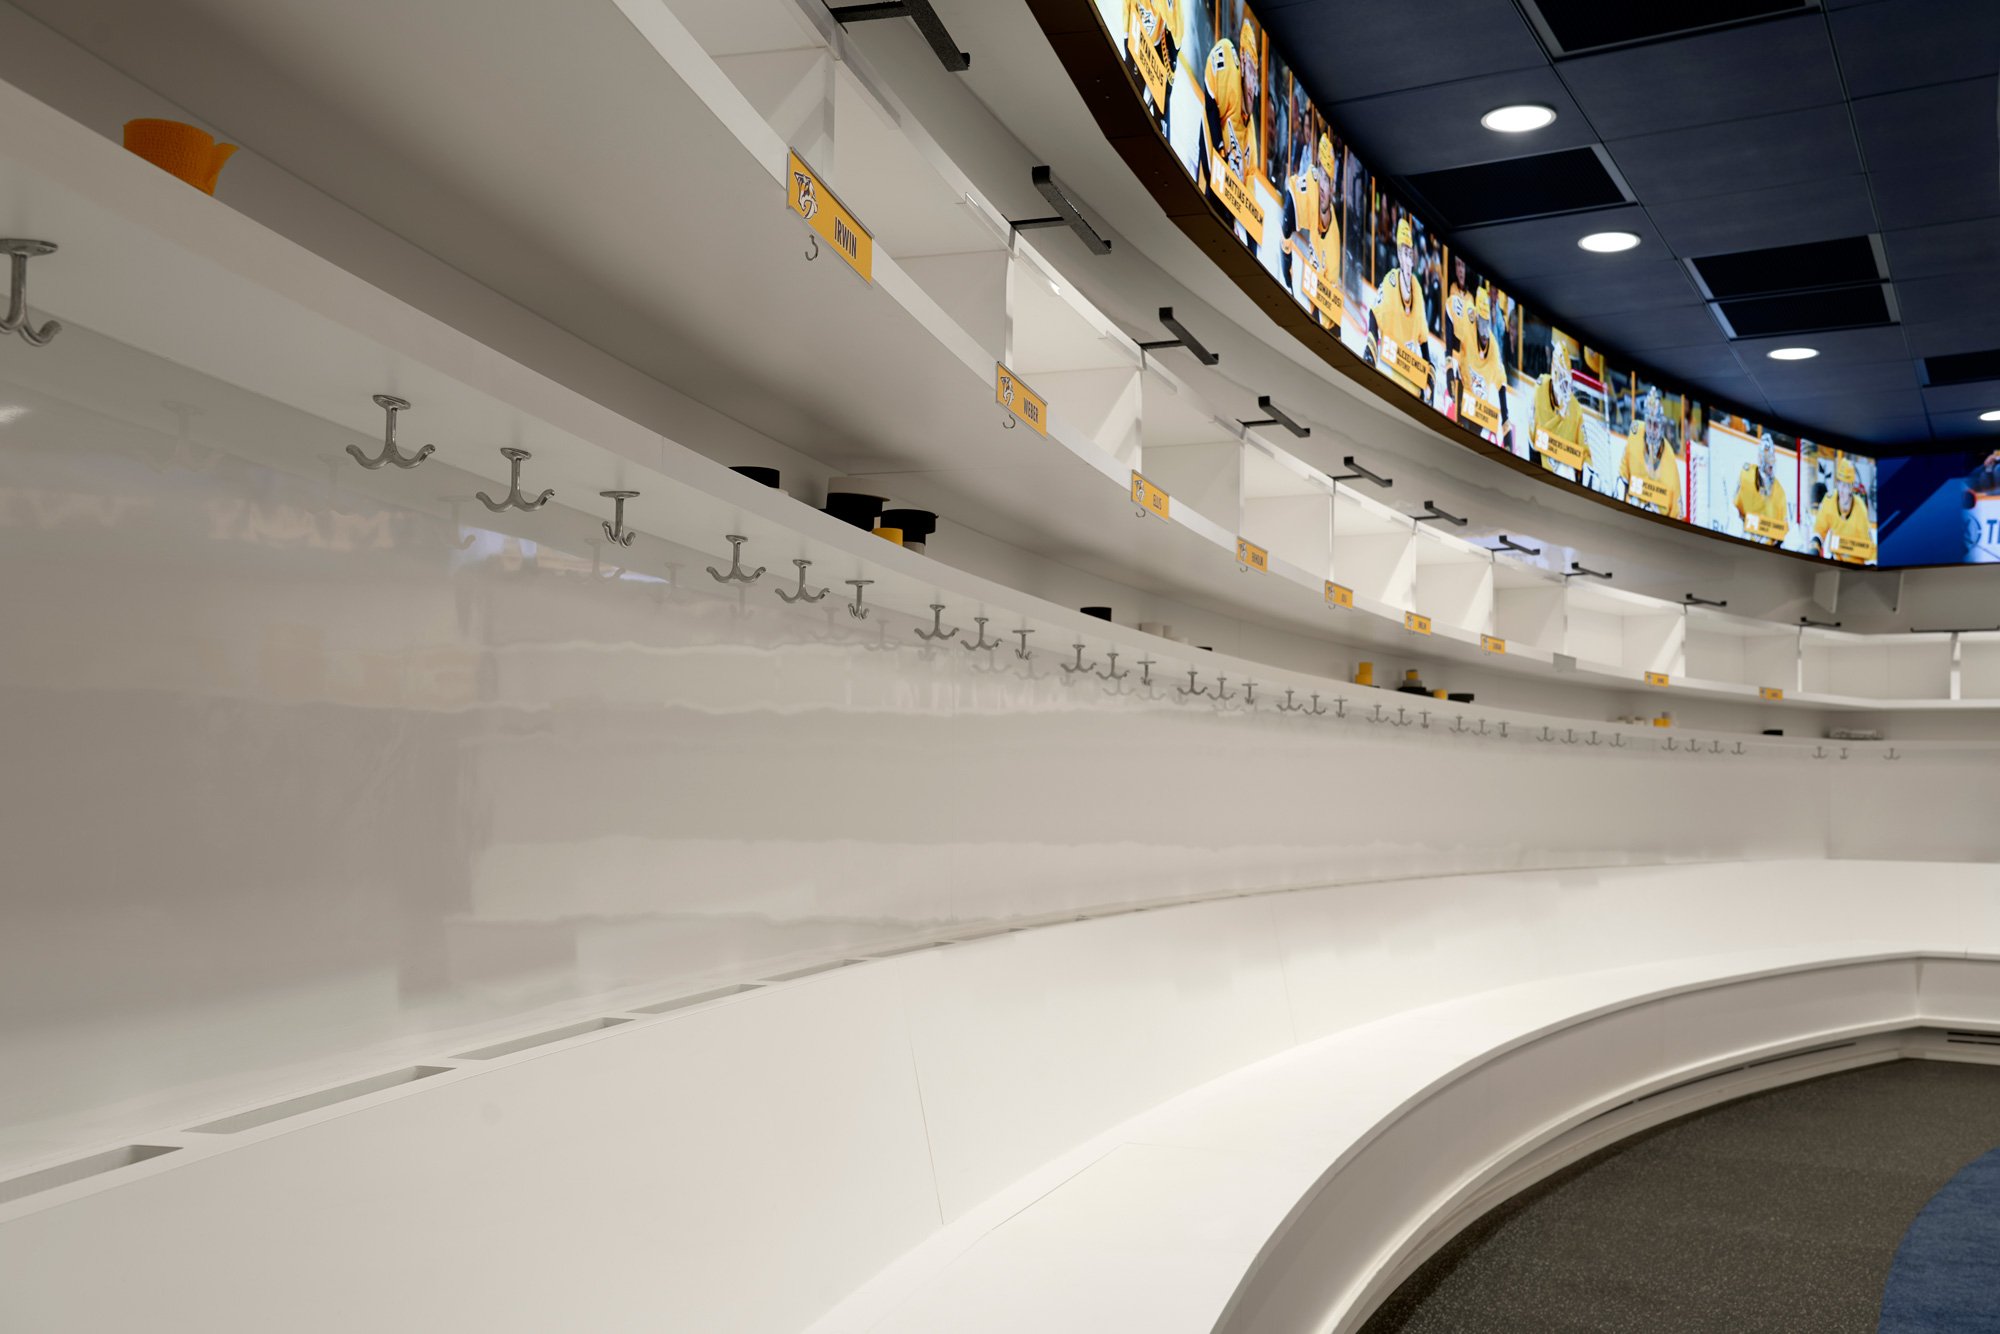 Architectural-Photograph-of-the-Nashville-Predators-Locker-Room-in-Nashville-Tennessee-by-Architectural-Photographer-Nick-McGinn-6.web.jpg